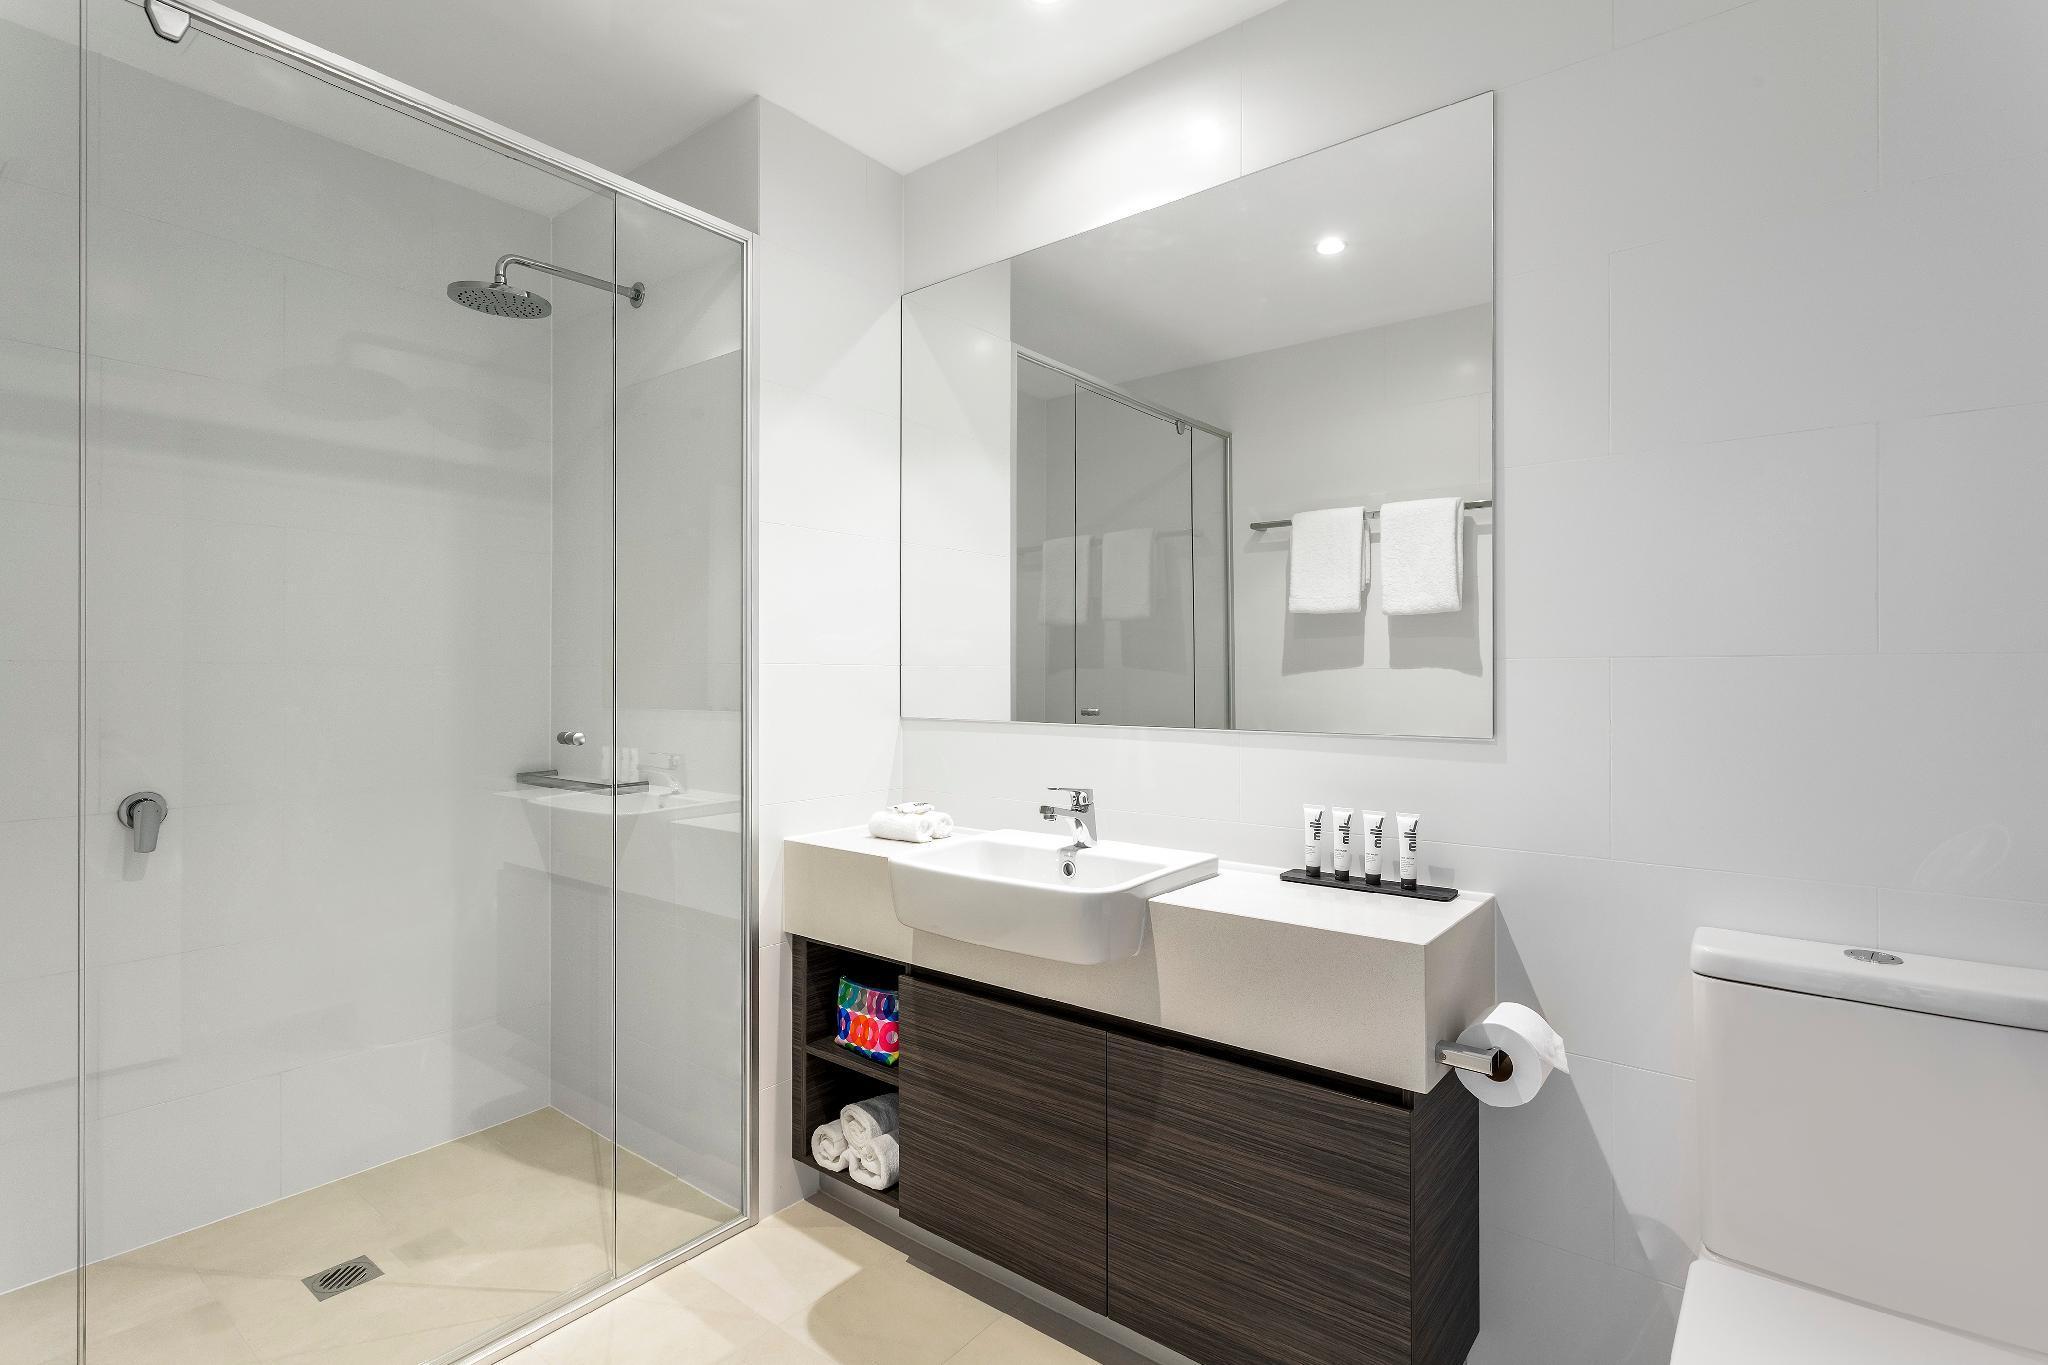 Bathroom Decor Tiles Joondalup Edgewater Wa Image Of Bathroom And Closet